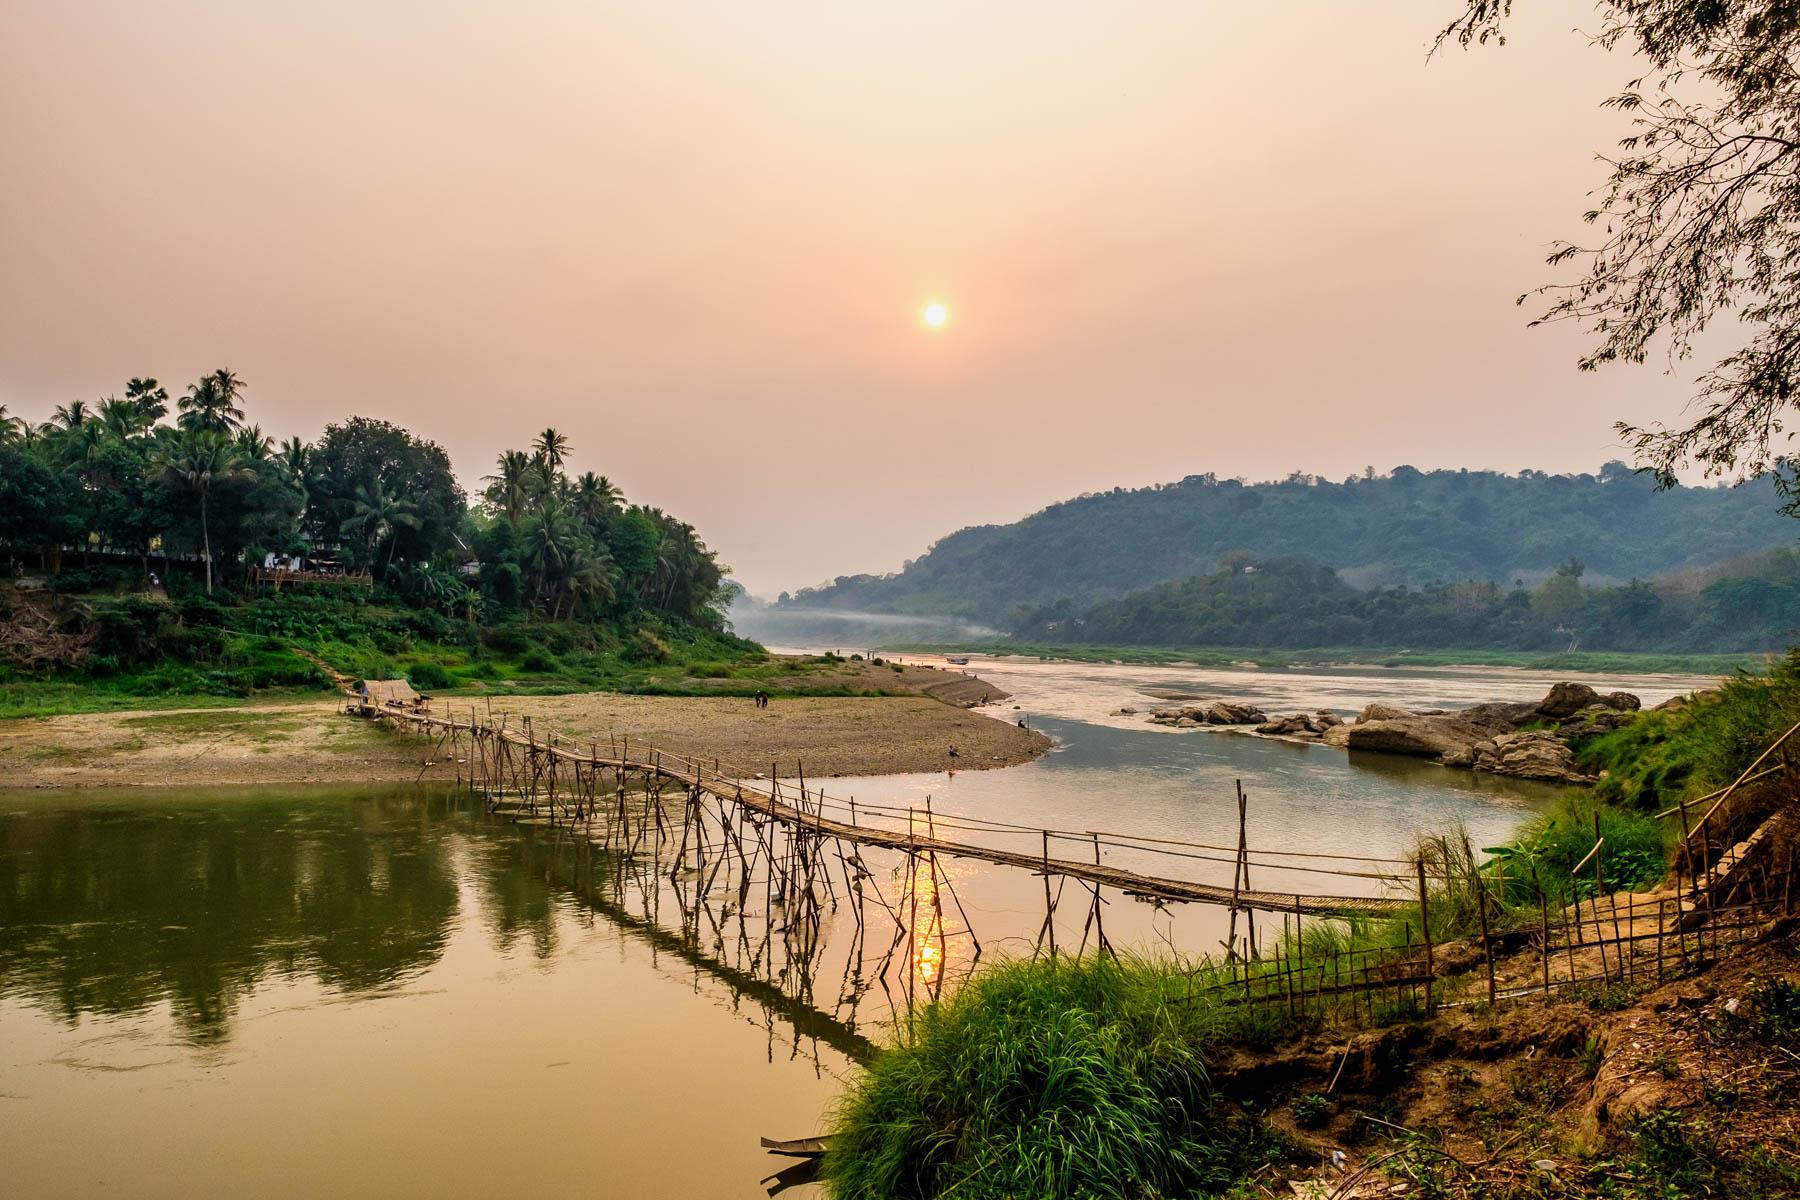 Bamboo bridge across Nam Khan river